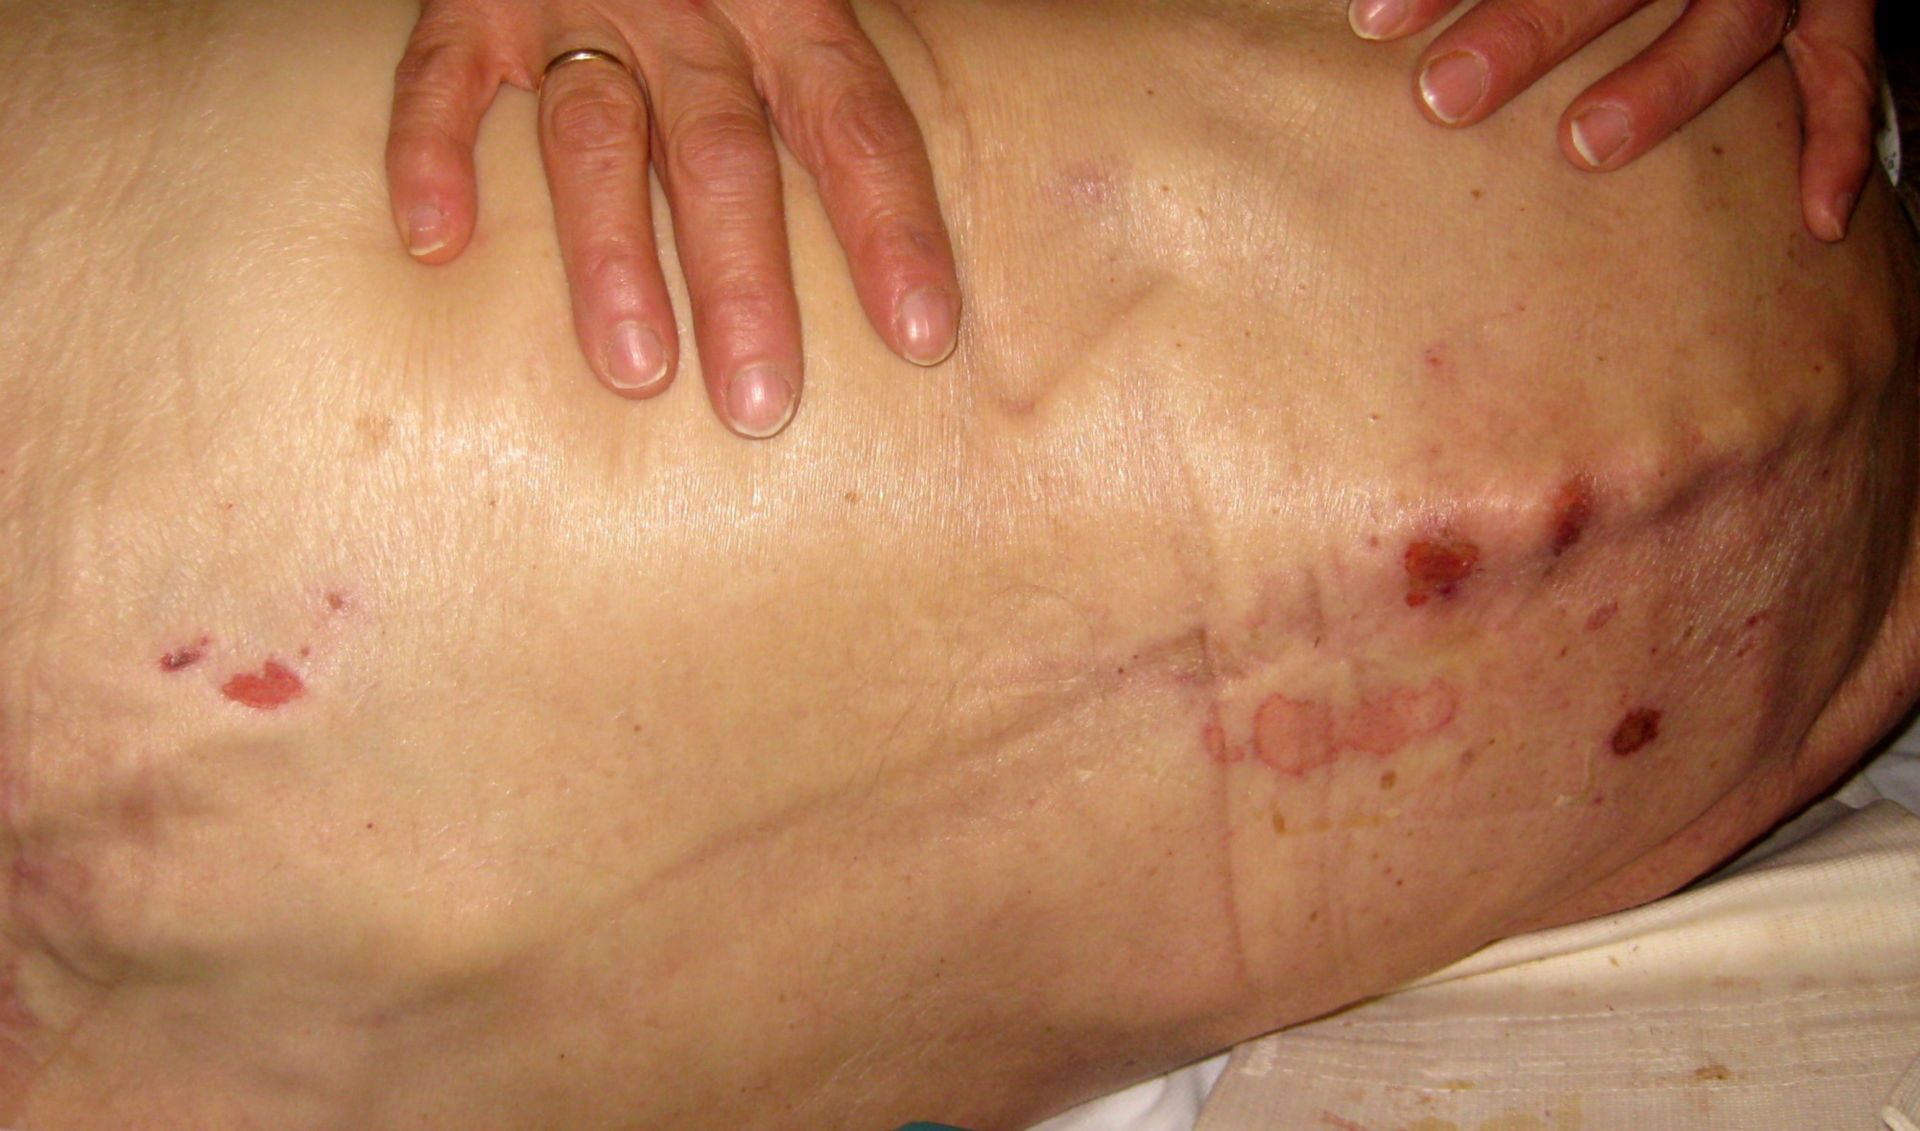 Decubital ulcer of the thoracic vertebral column, grade I/II